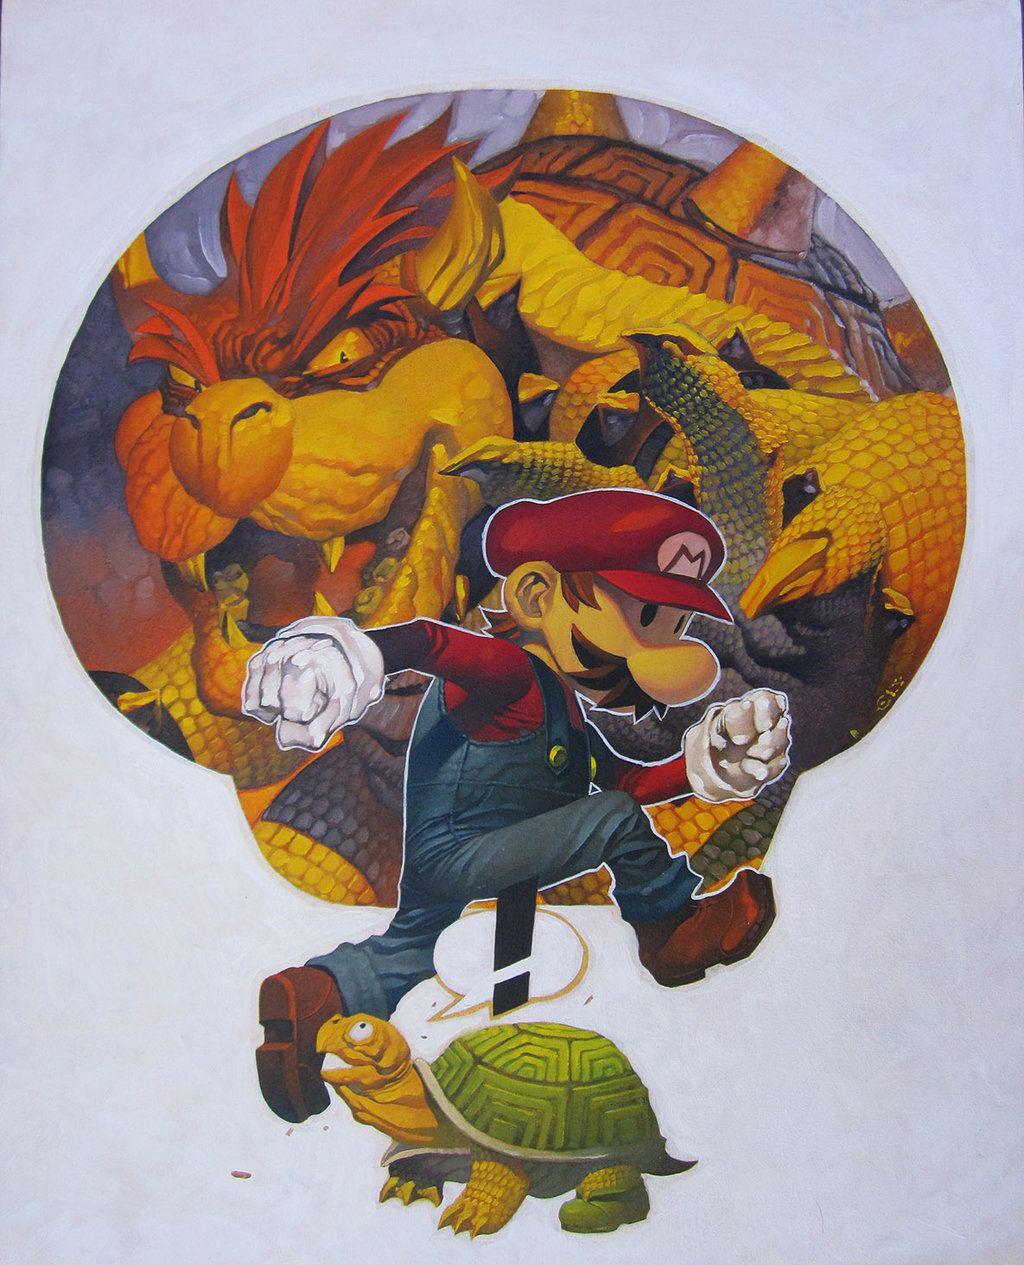 Super Mario by ChristopherStevens on DeviantArt